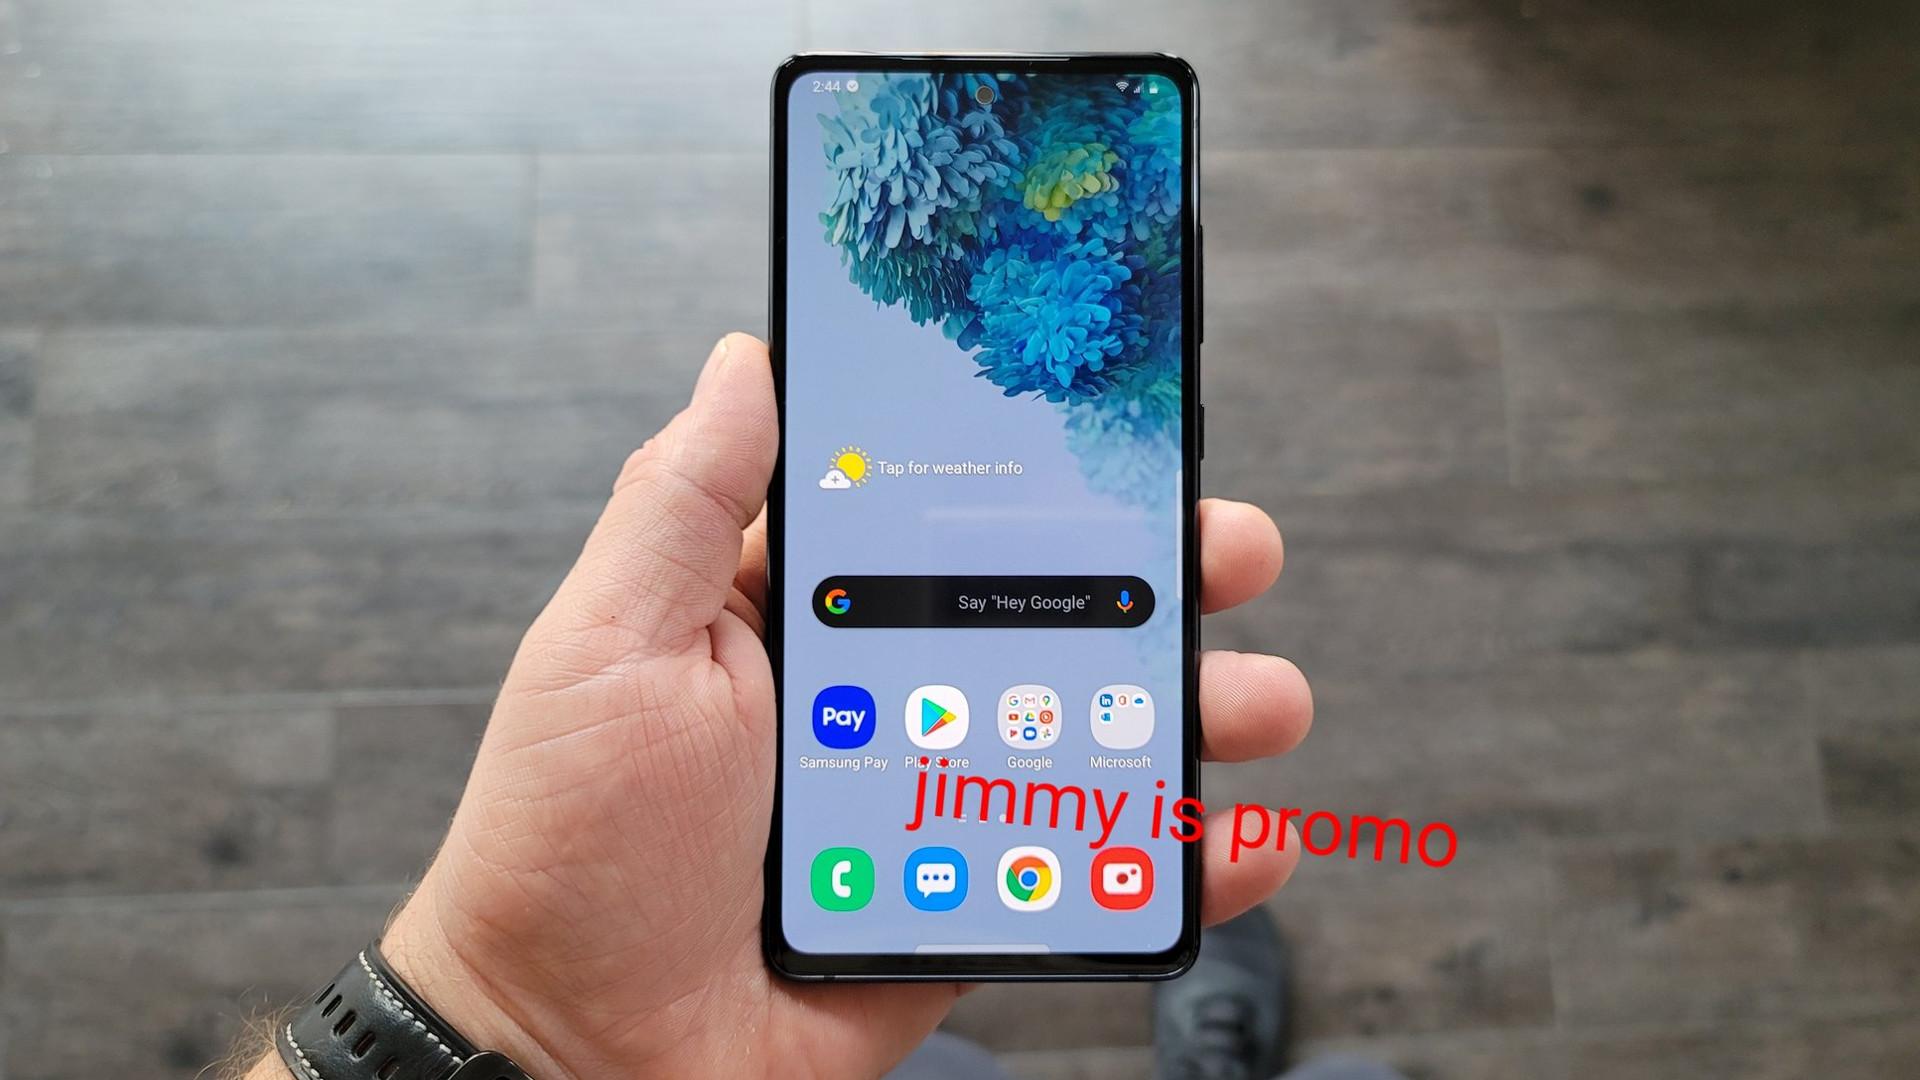 Samsung Galaxy S20 FE jimmy is promo